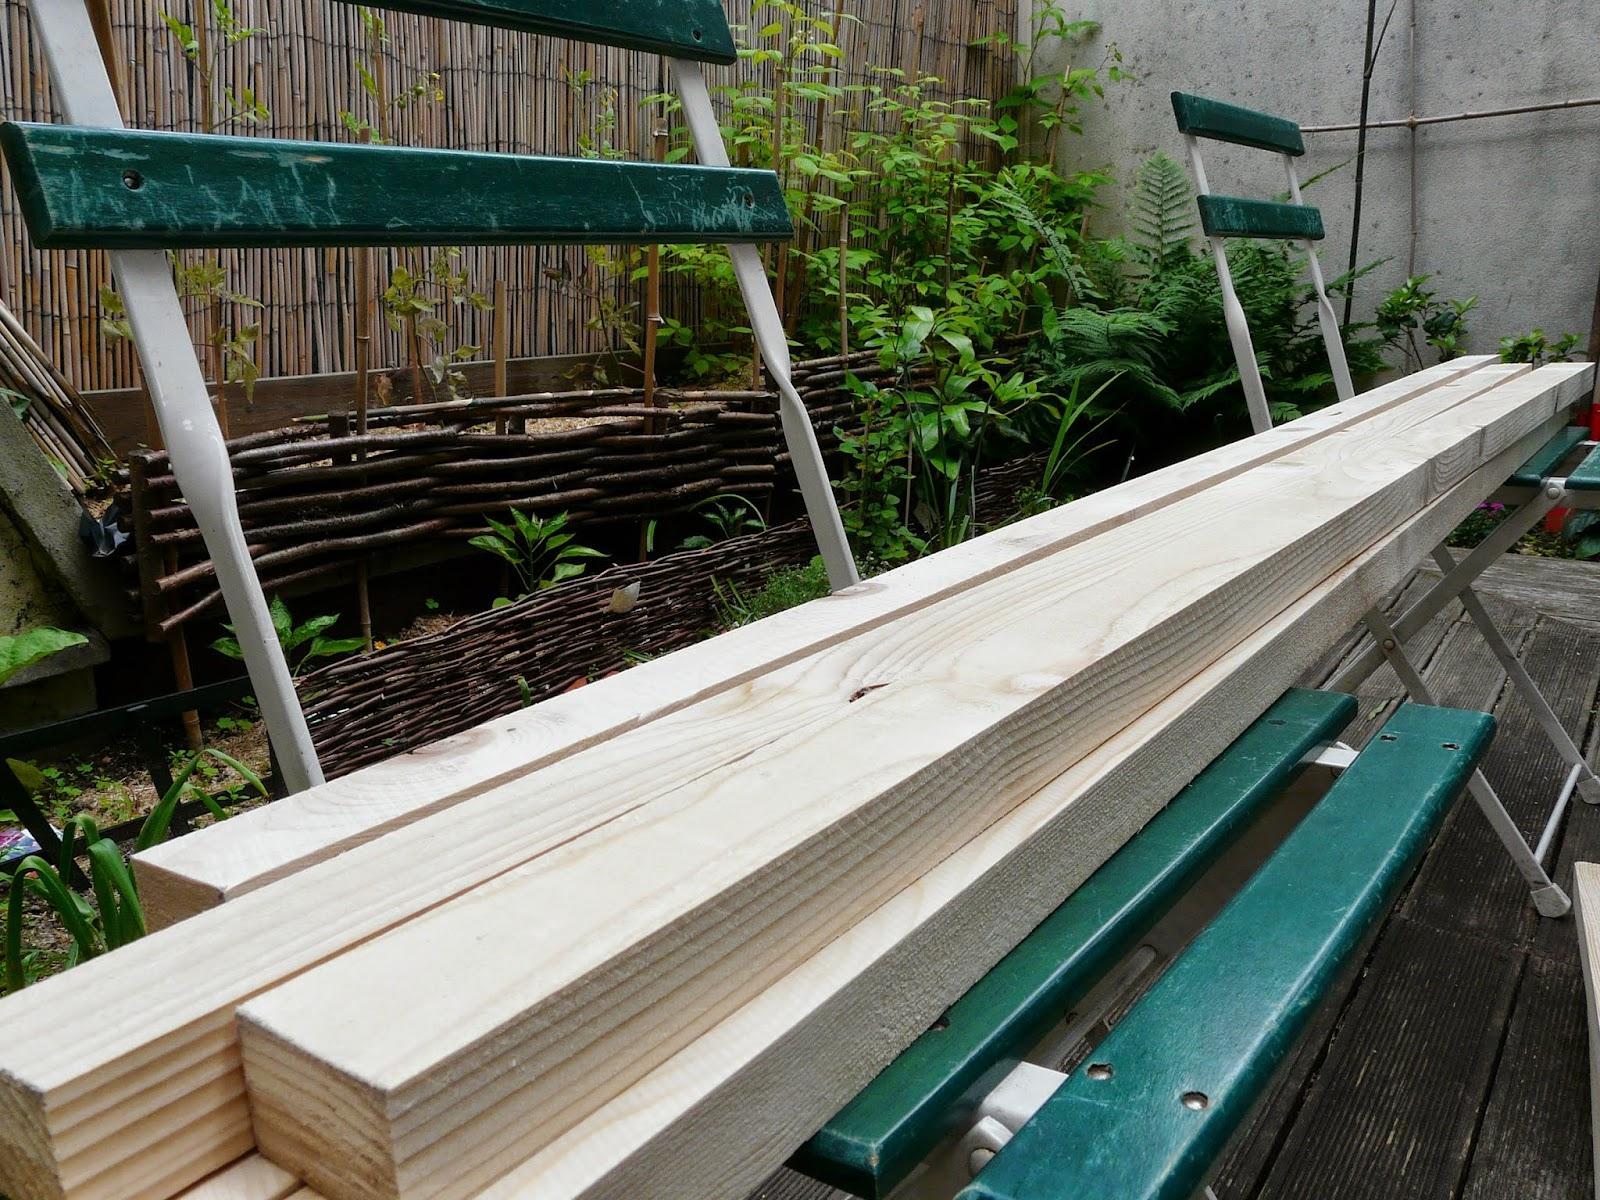 Tante Cath ... Le Blog !: Diy Construire Sa Cabane De Jardin encequiconcerne Fabriquer Une Cabane De Jardin